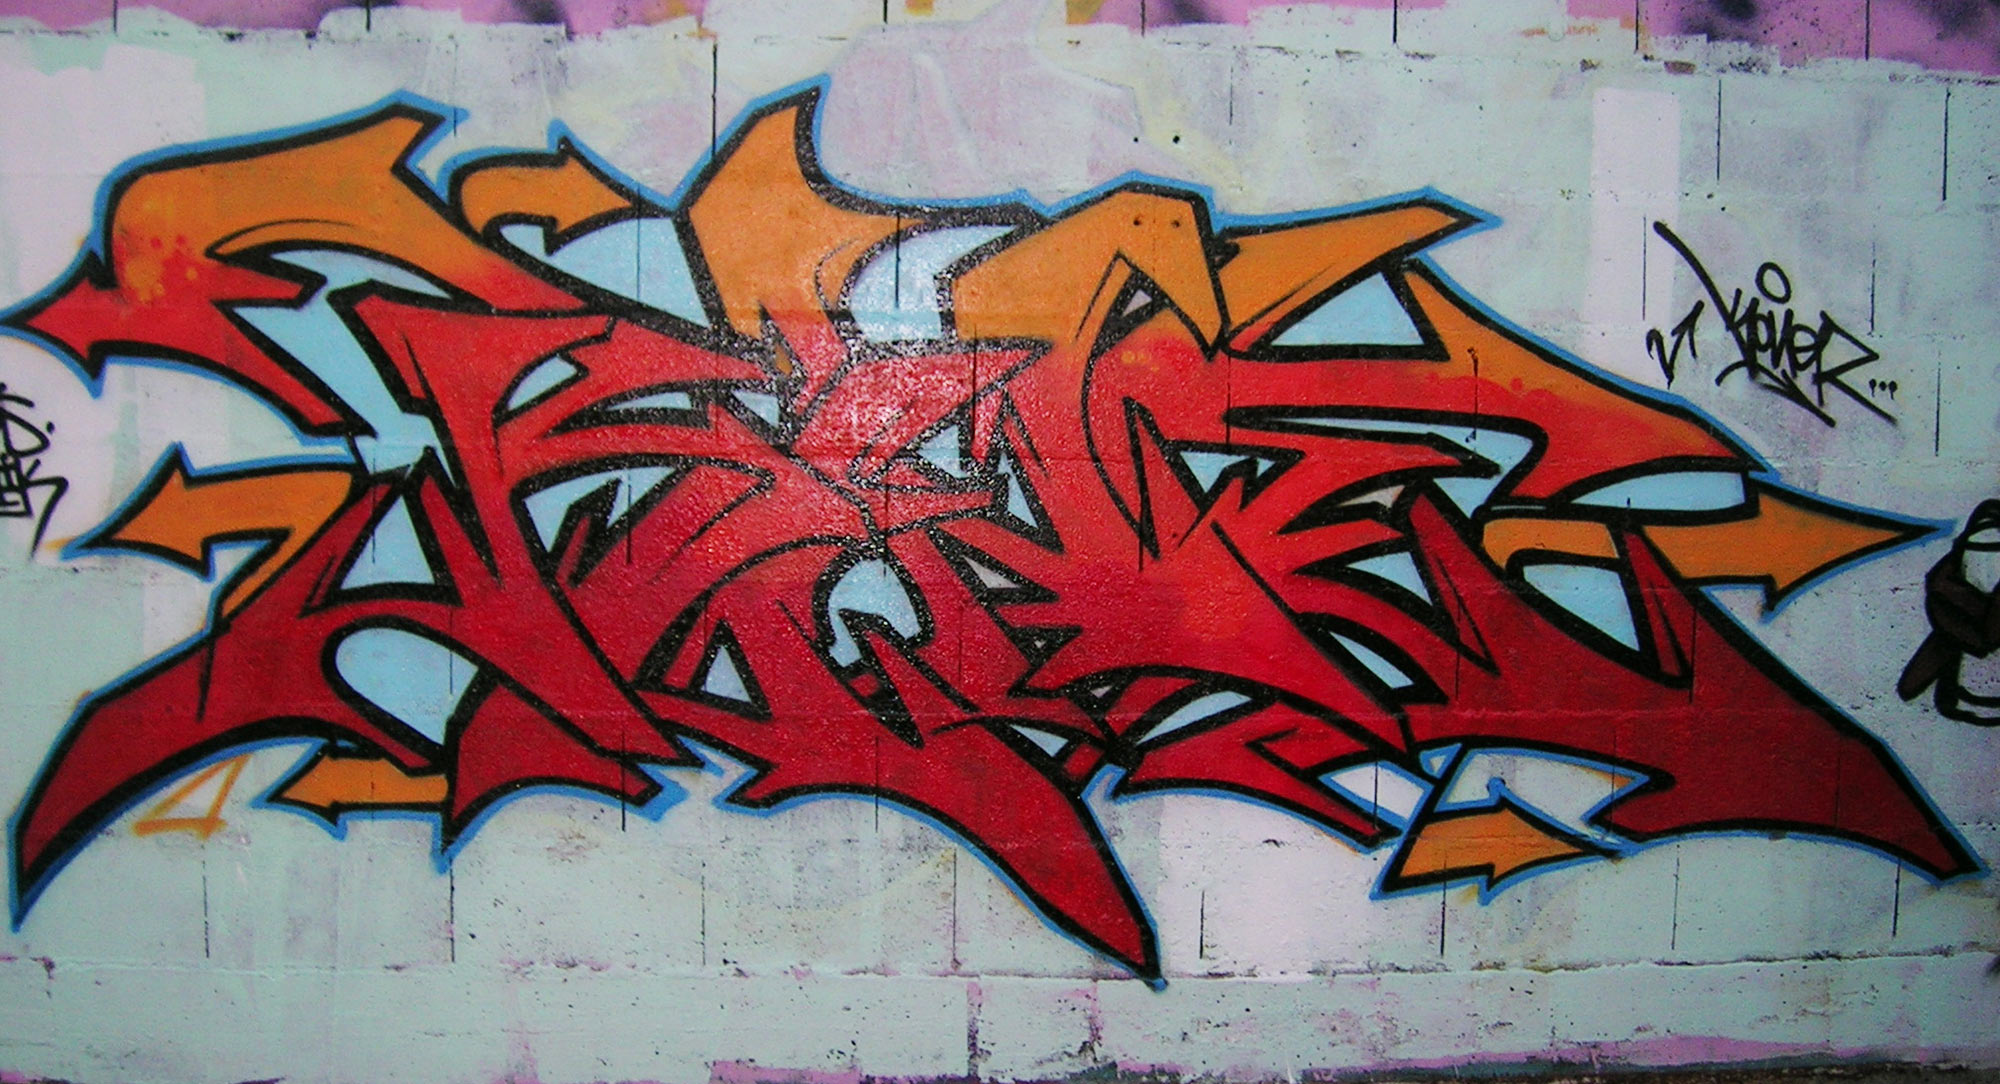 Koner - Graffiti - Brad Tout - Riom